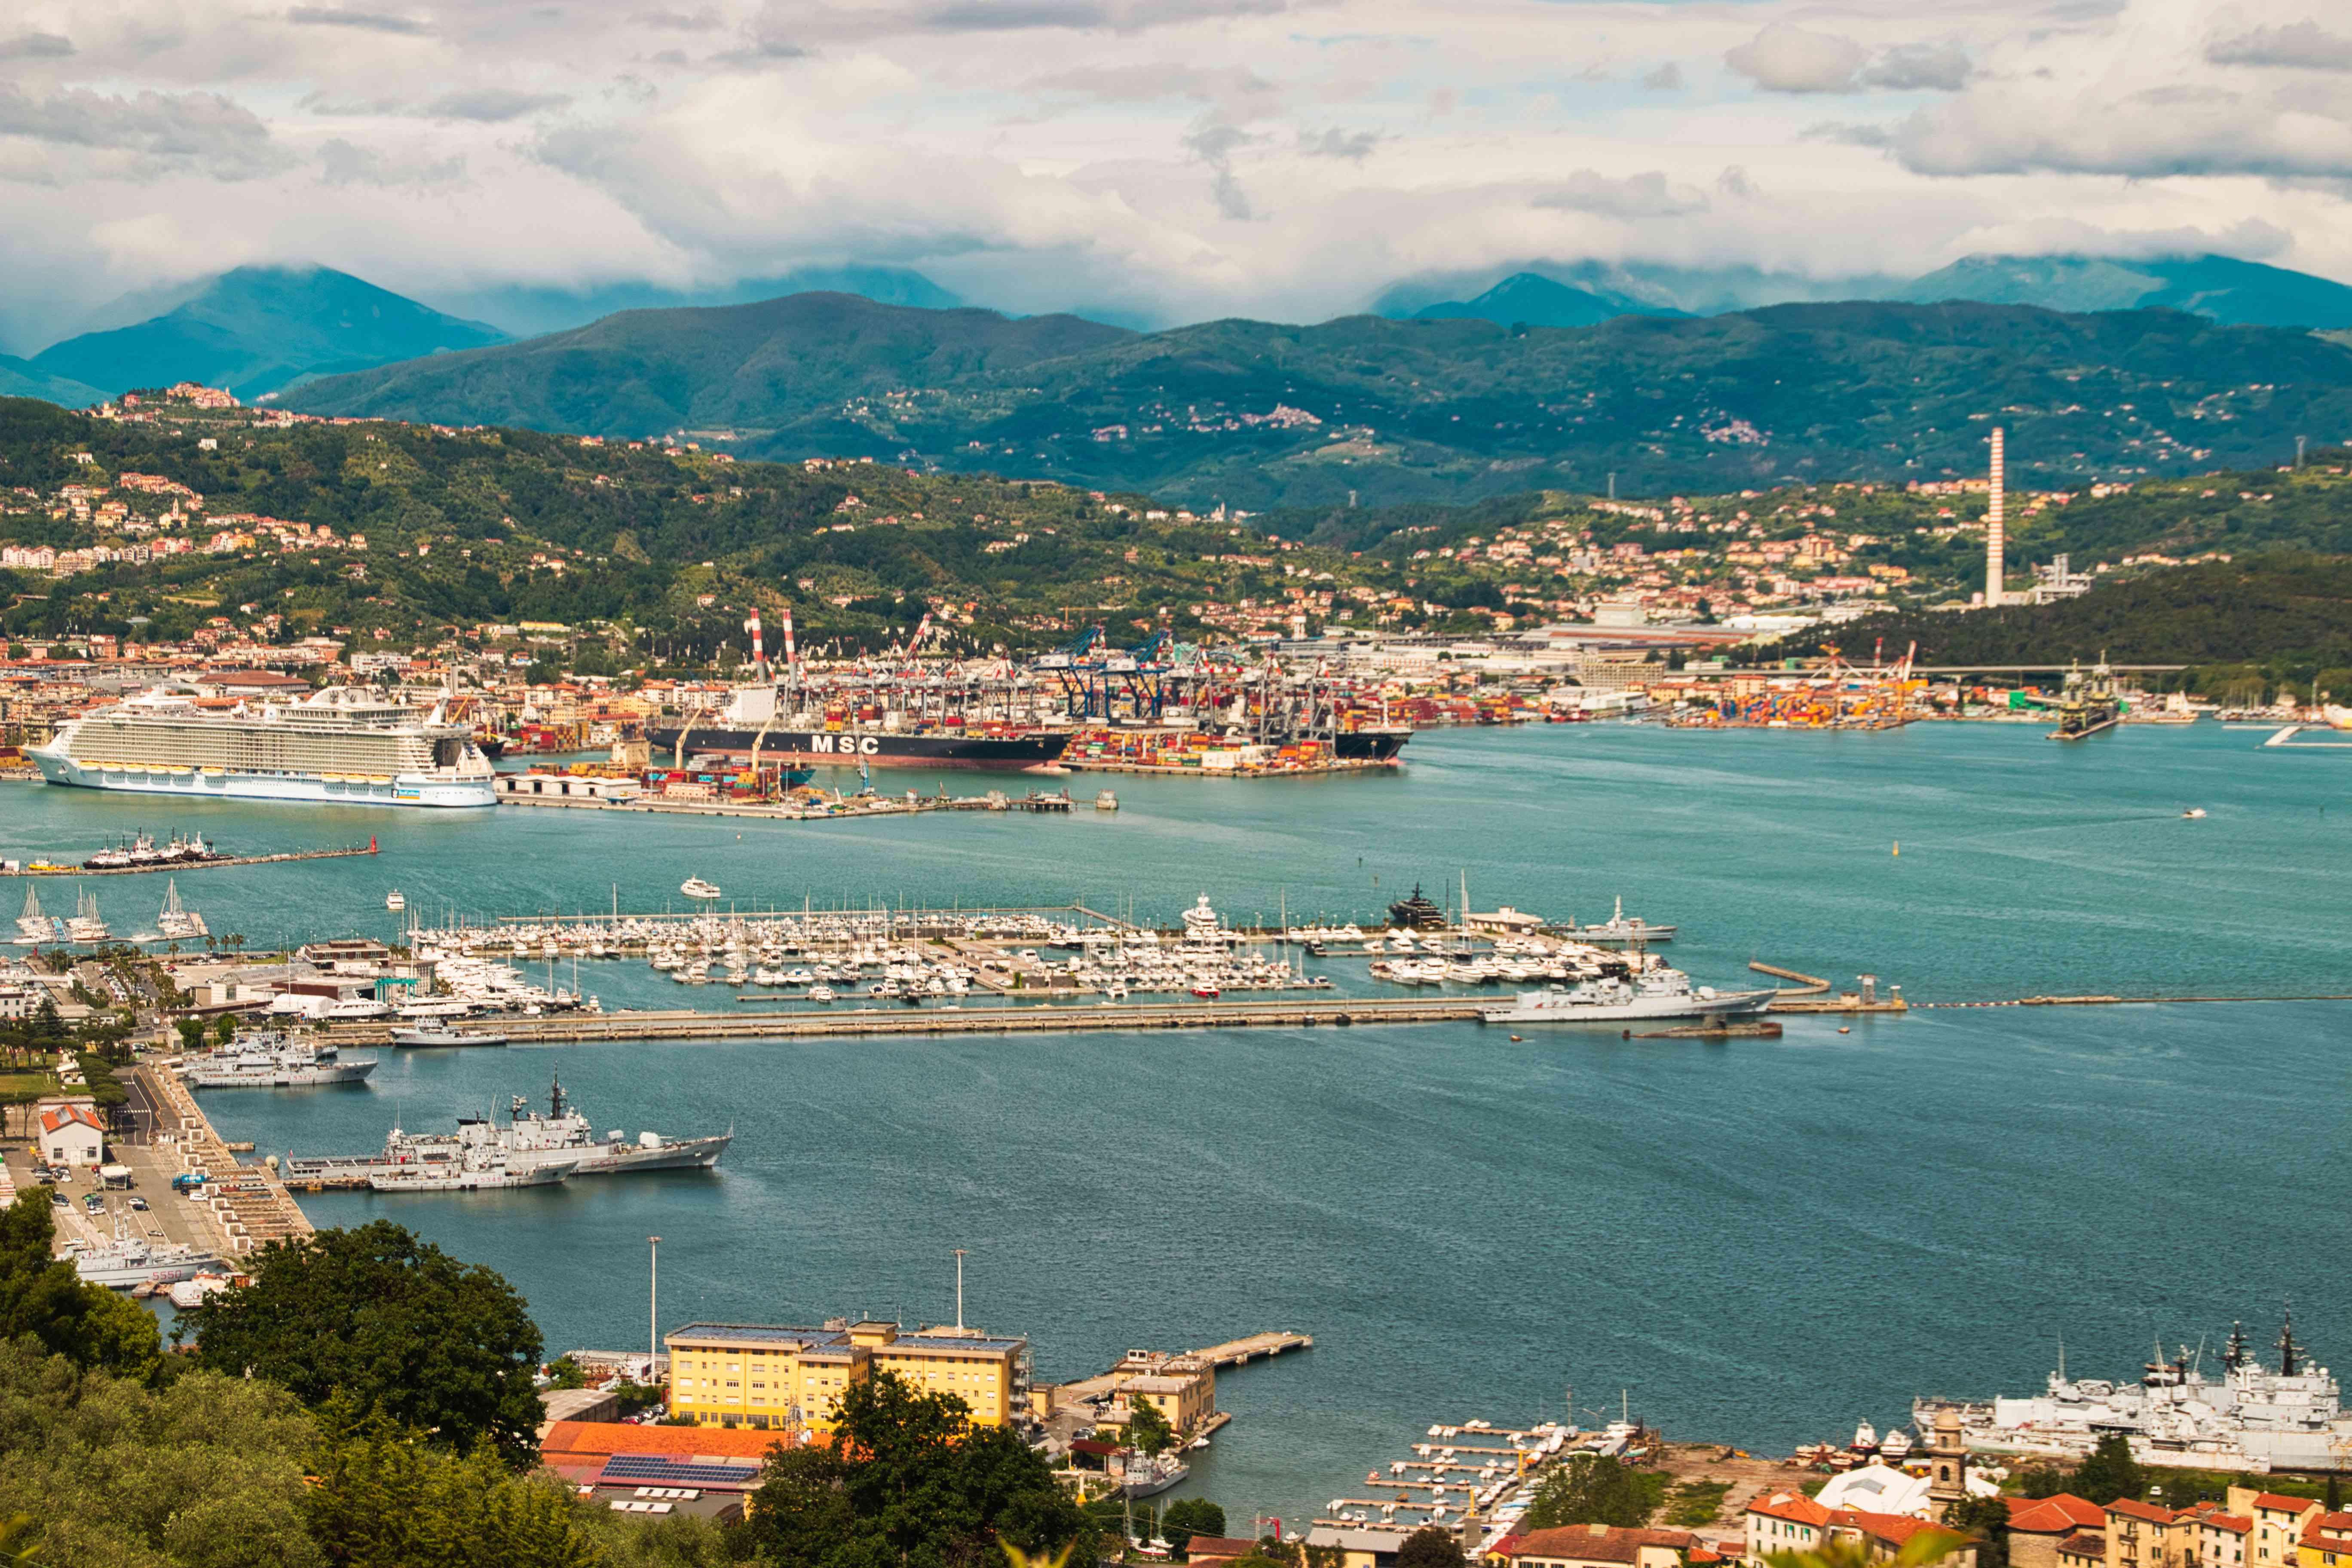 Top 9 Attractions In La Spezia Italy